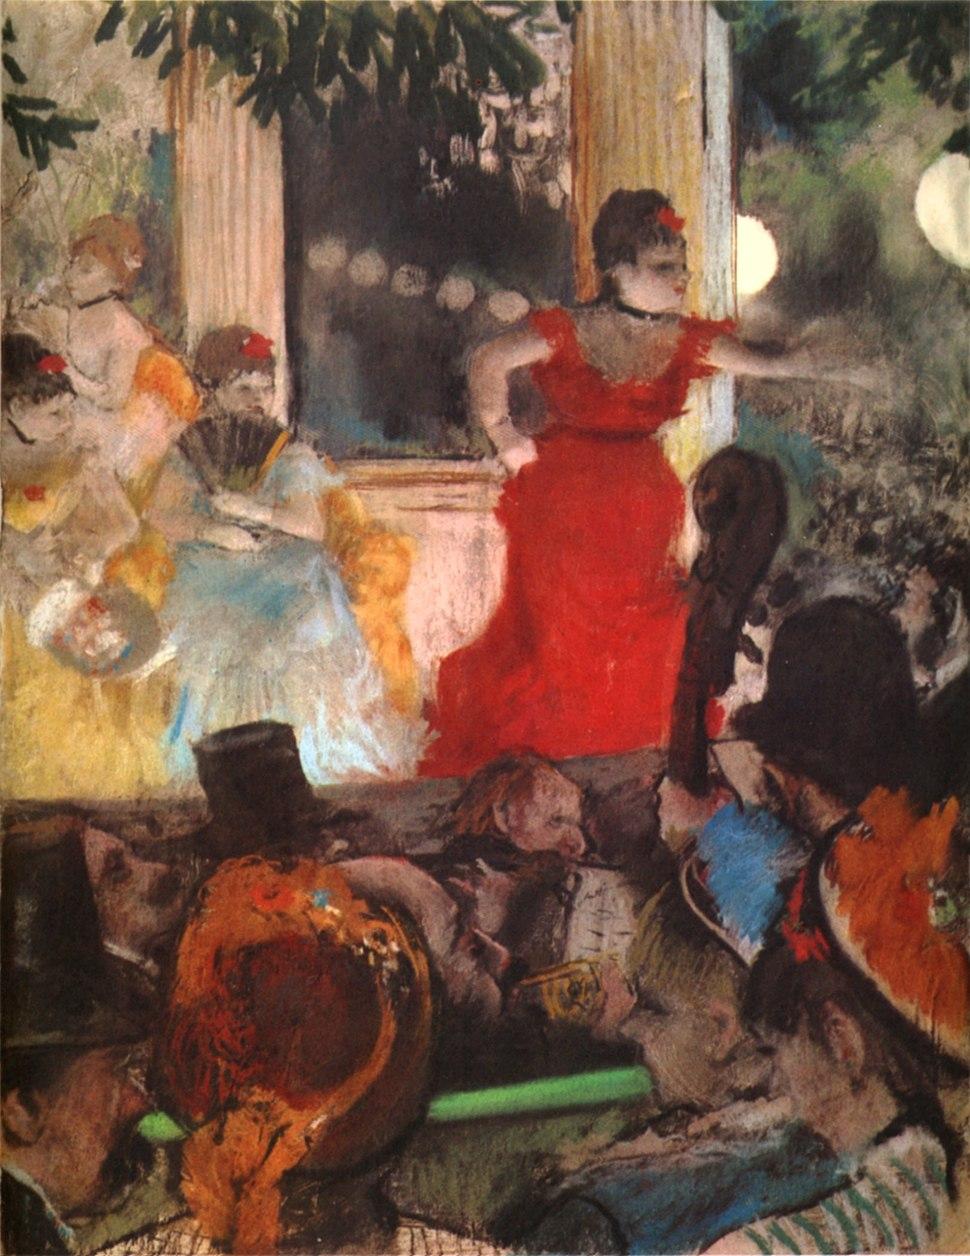 Degas - Café Concert - at Les Ambassadeurs 1876-77